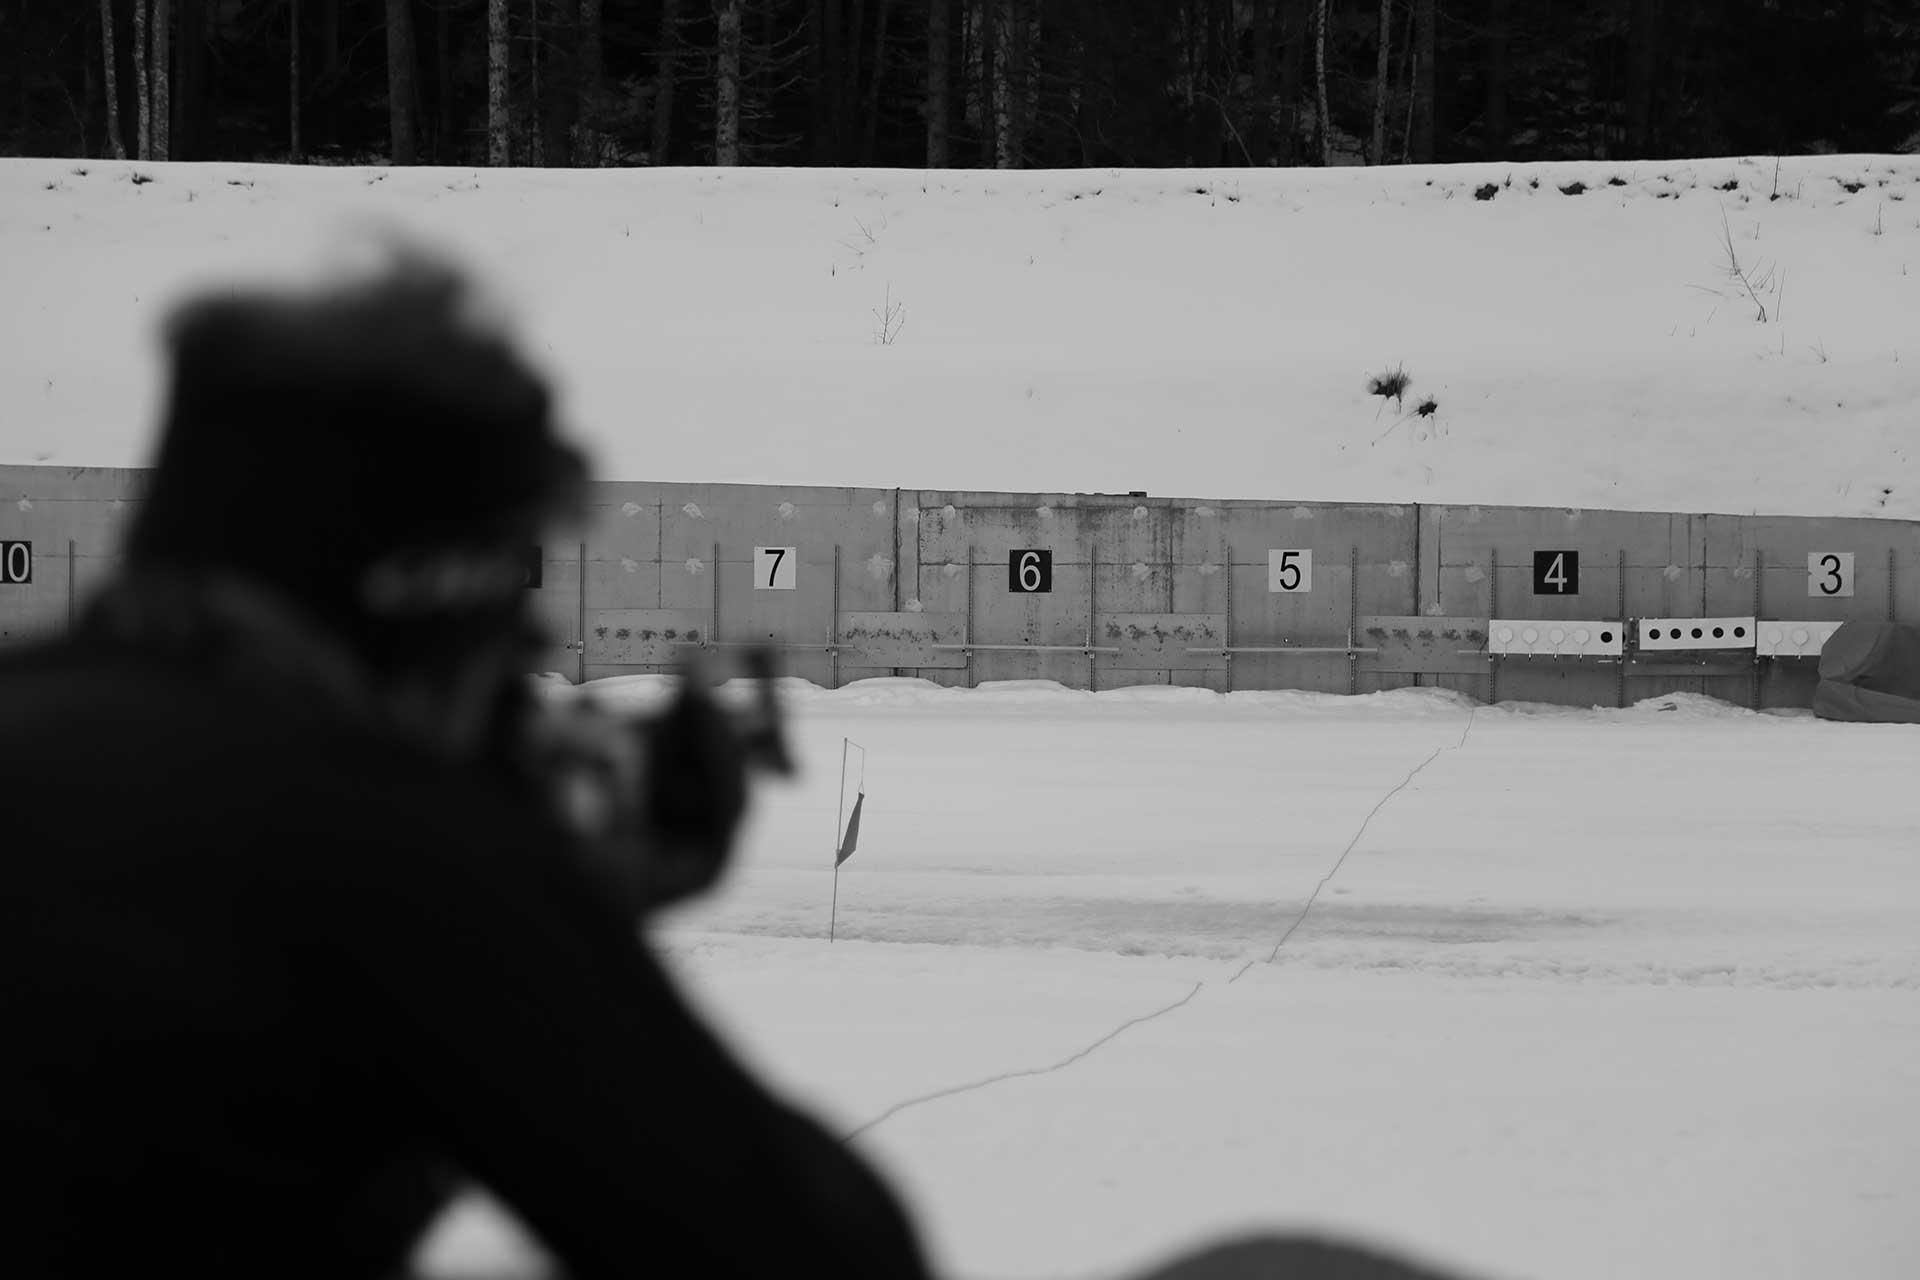 biathlon-col-de-porte-chartreuse-grenoble